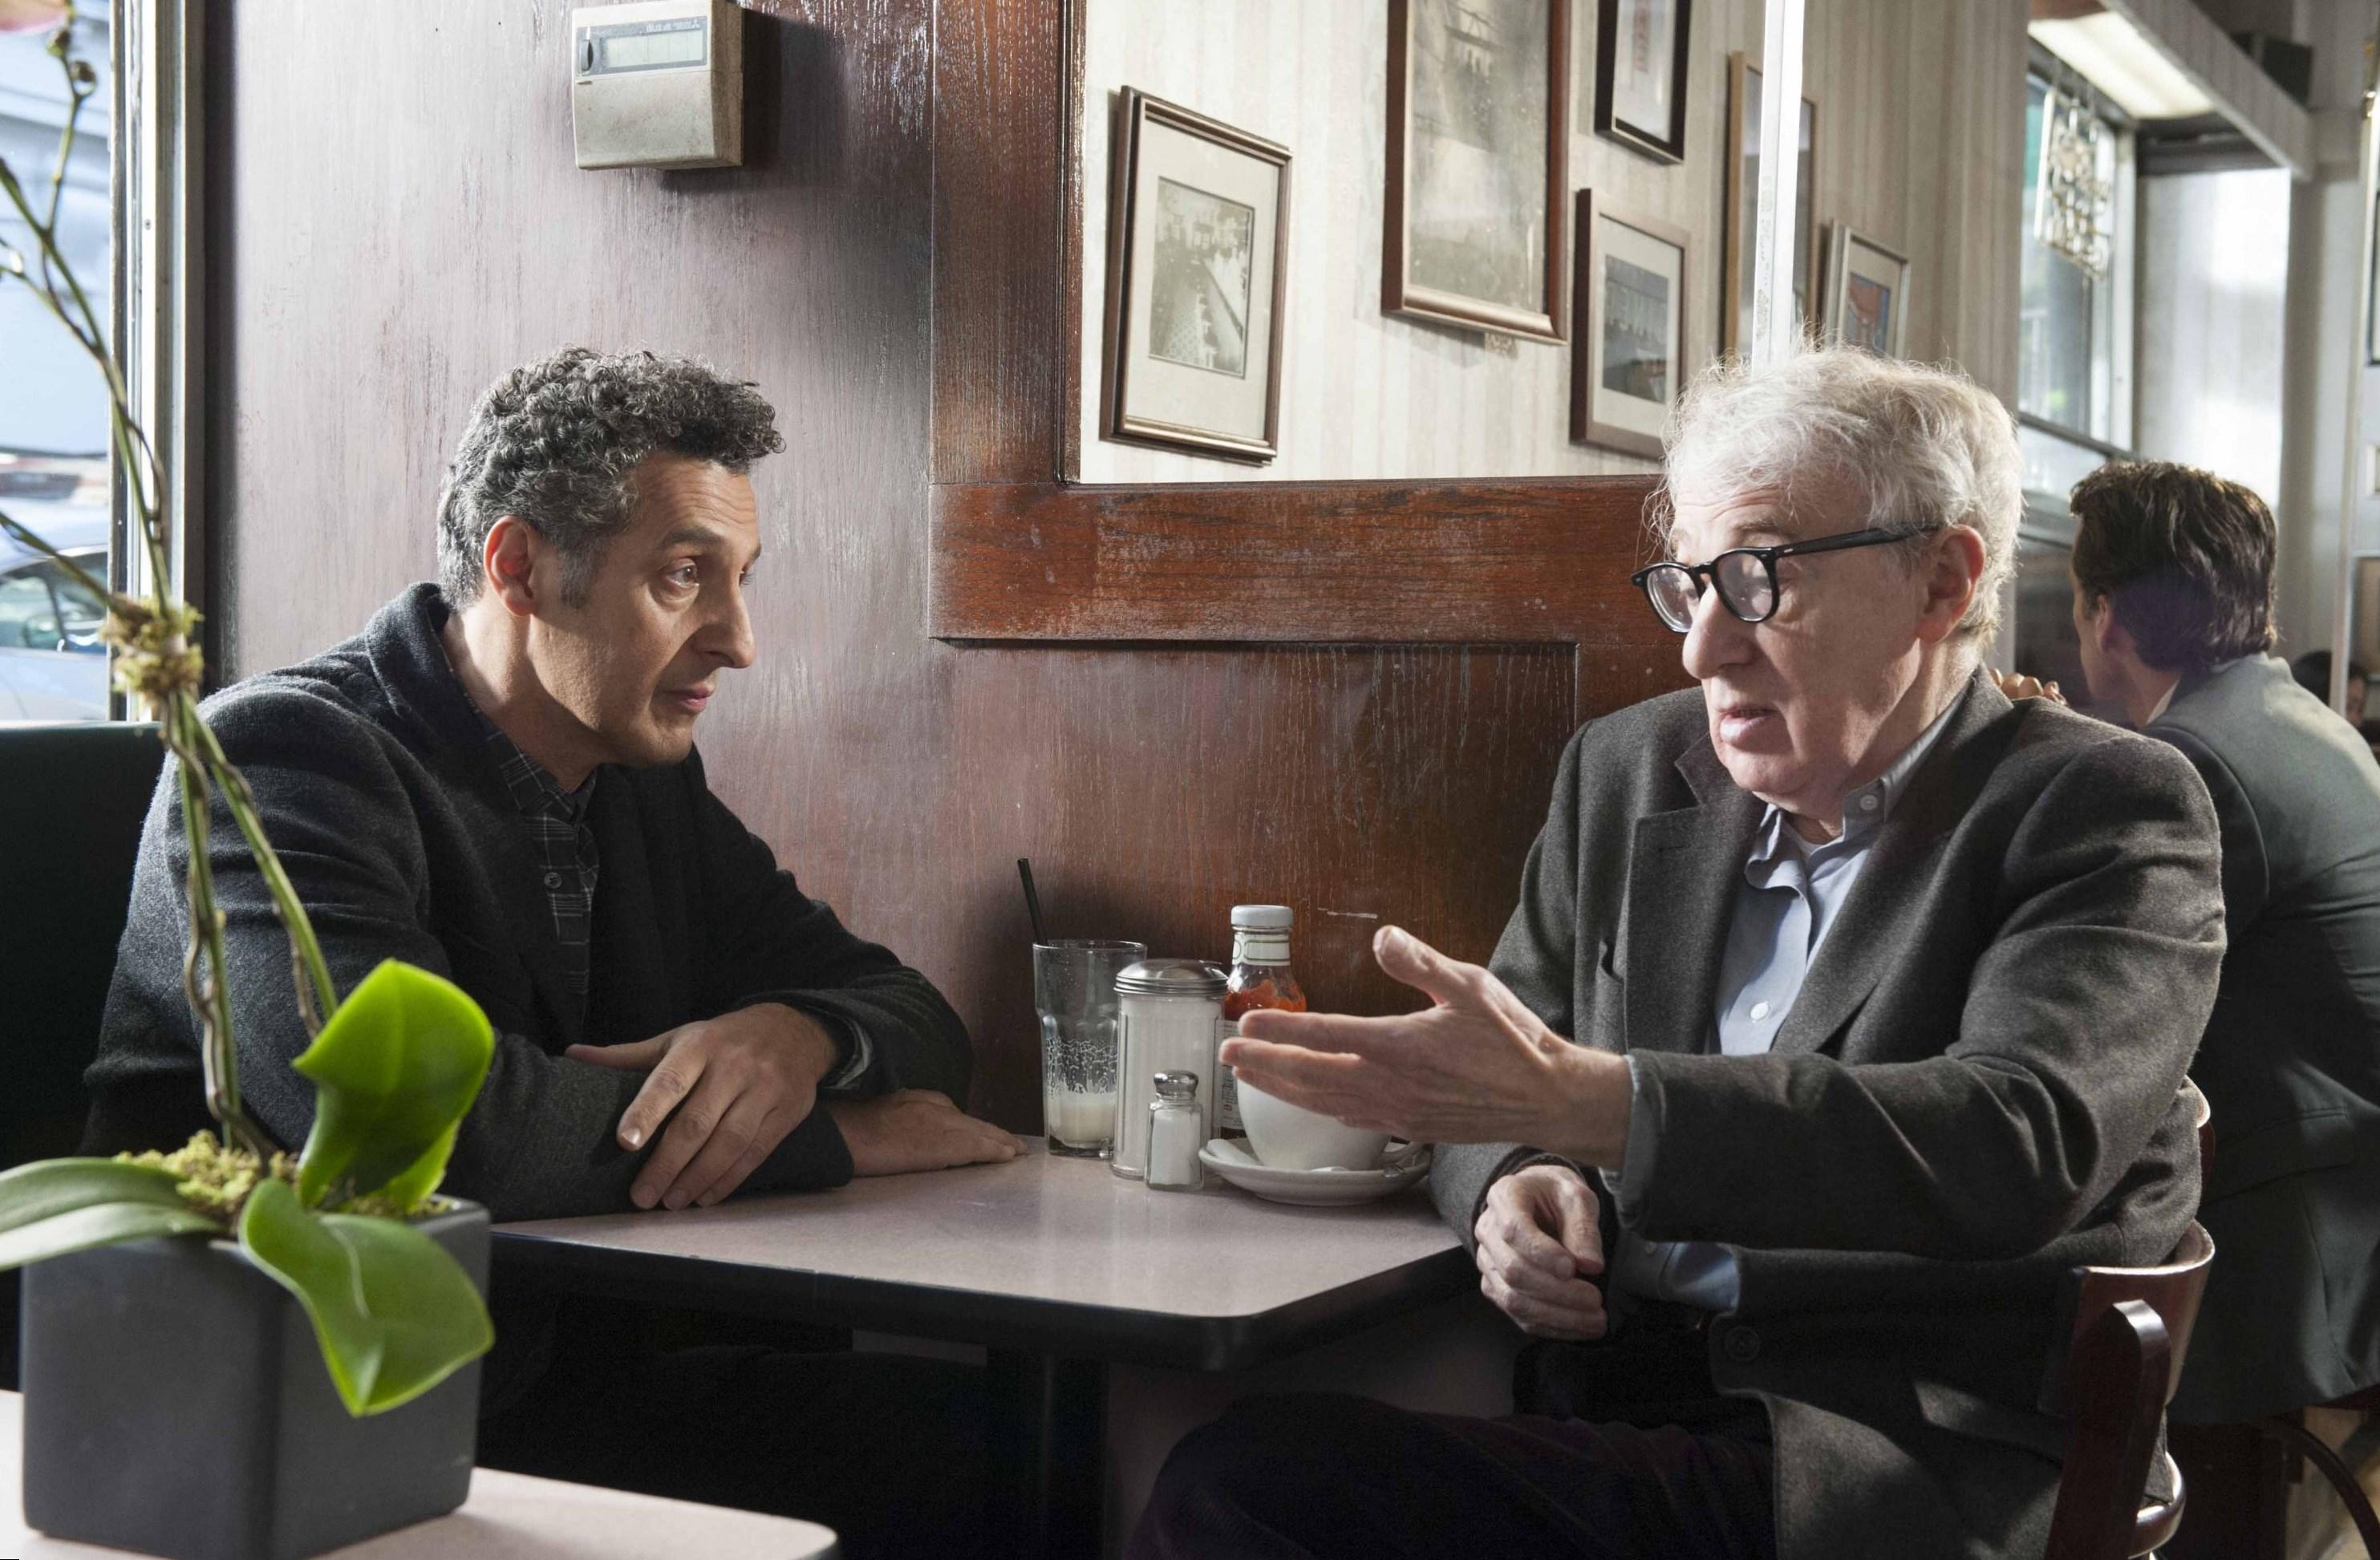 Woody Allen celebrity net worth - salary, house, car